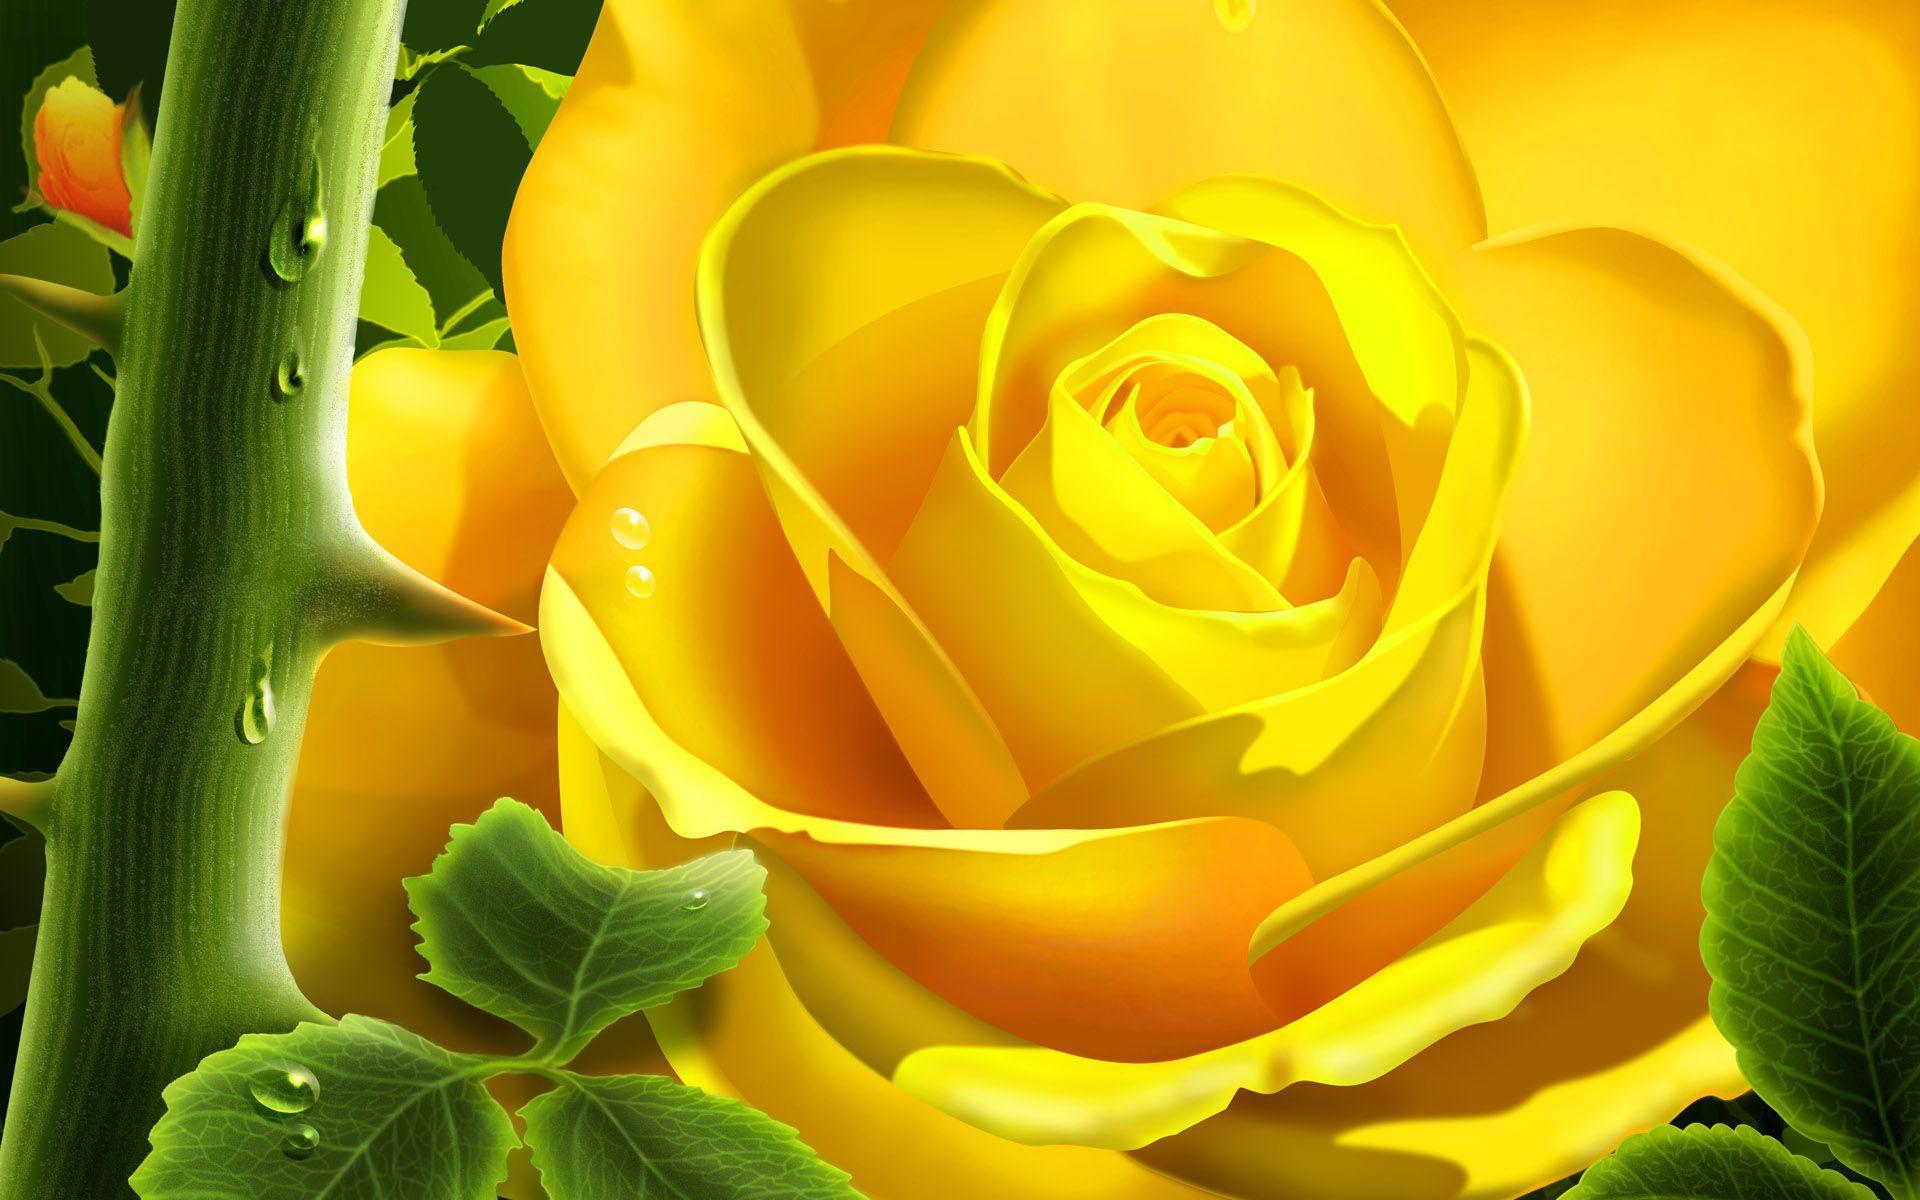 Hd wallpaper yellow rose - Yellow Rose Wallpapers Full Hd Wallpaper Search